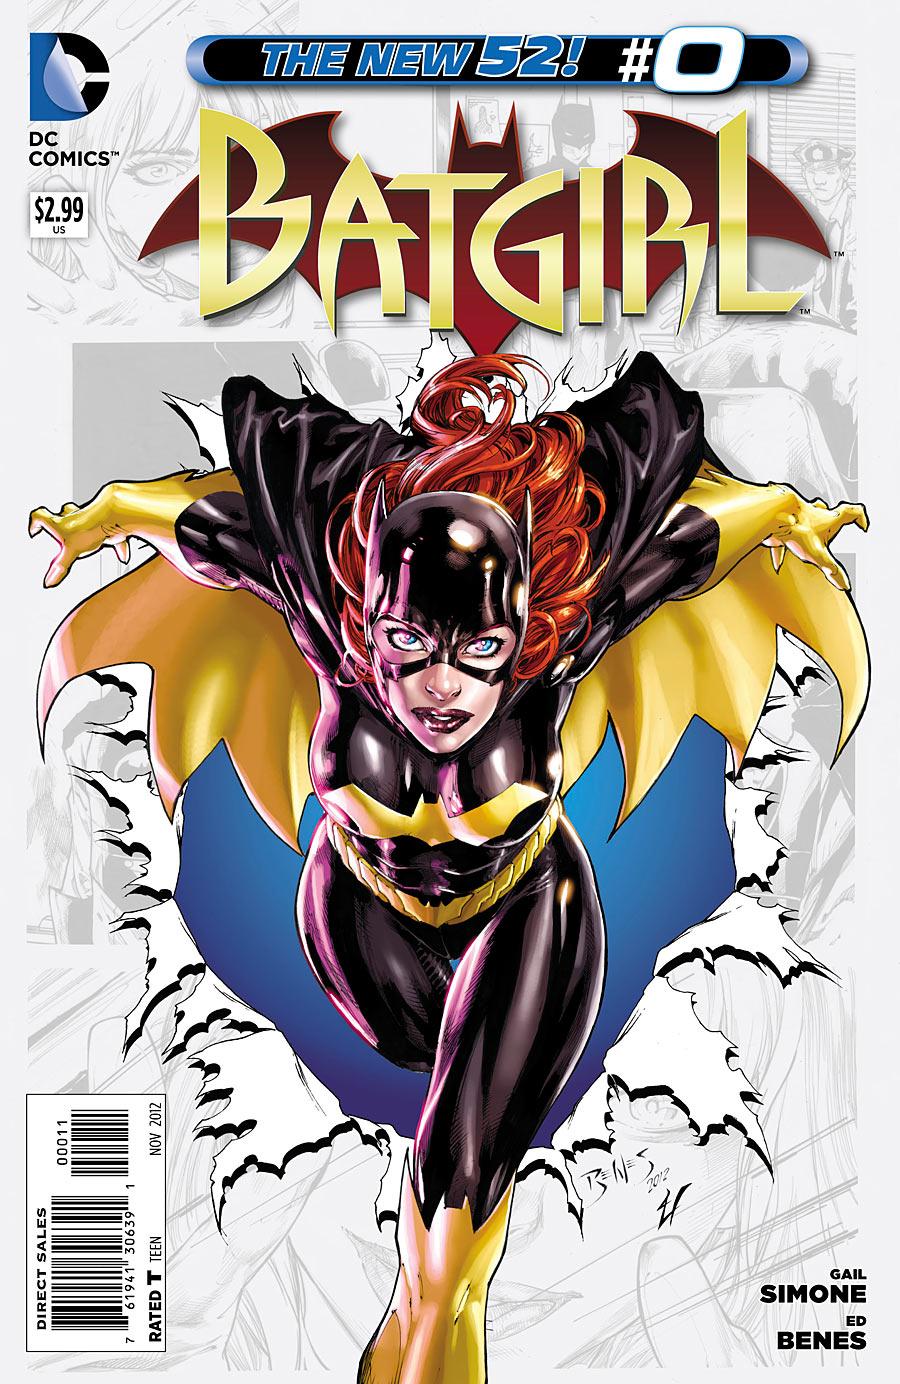 Batgirl 0 issue